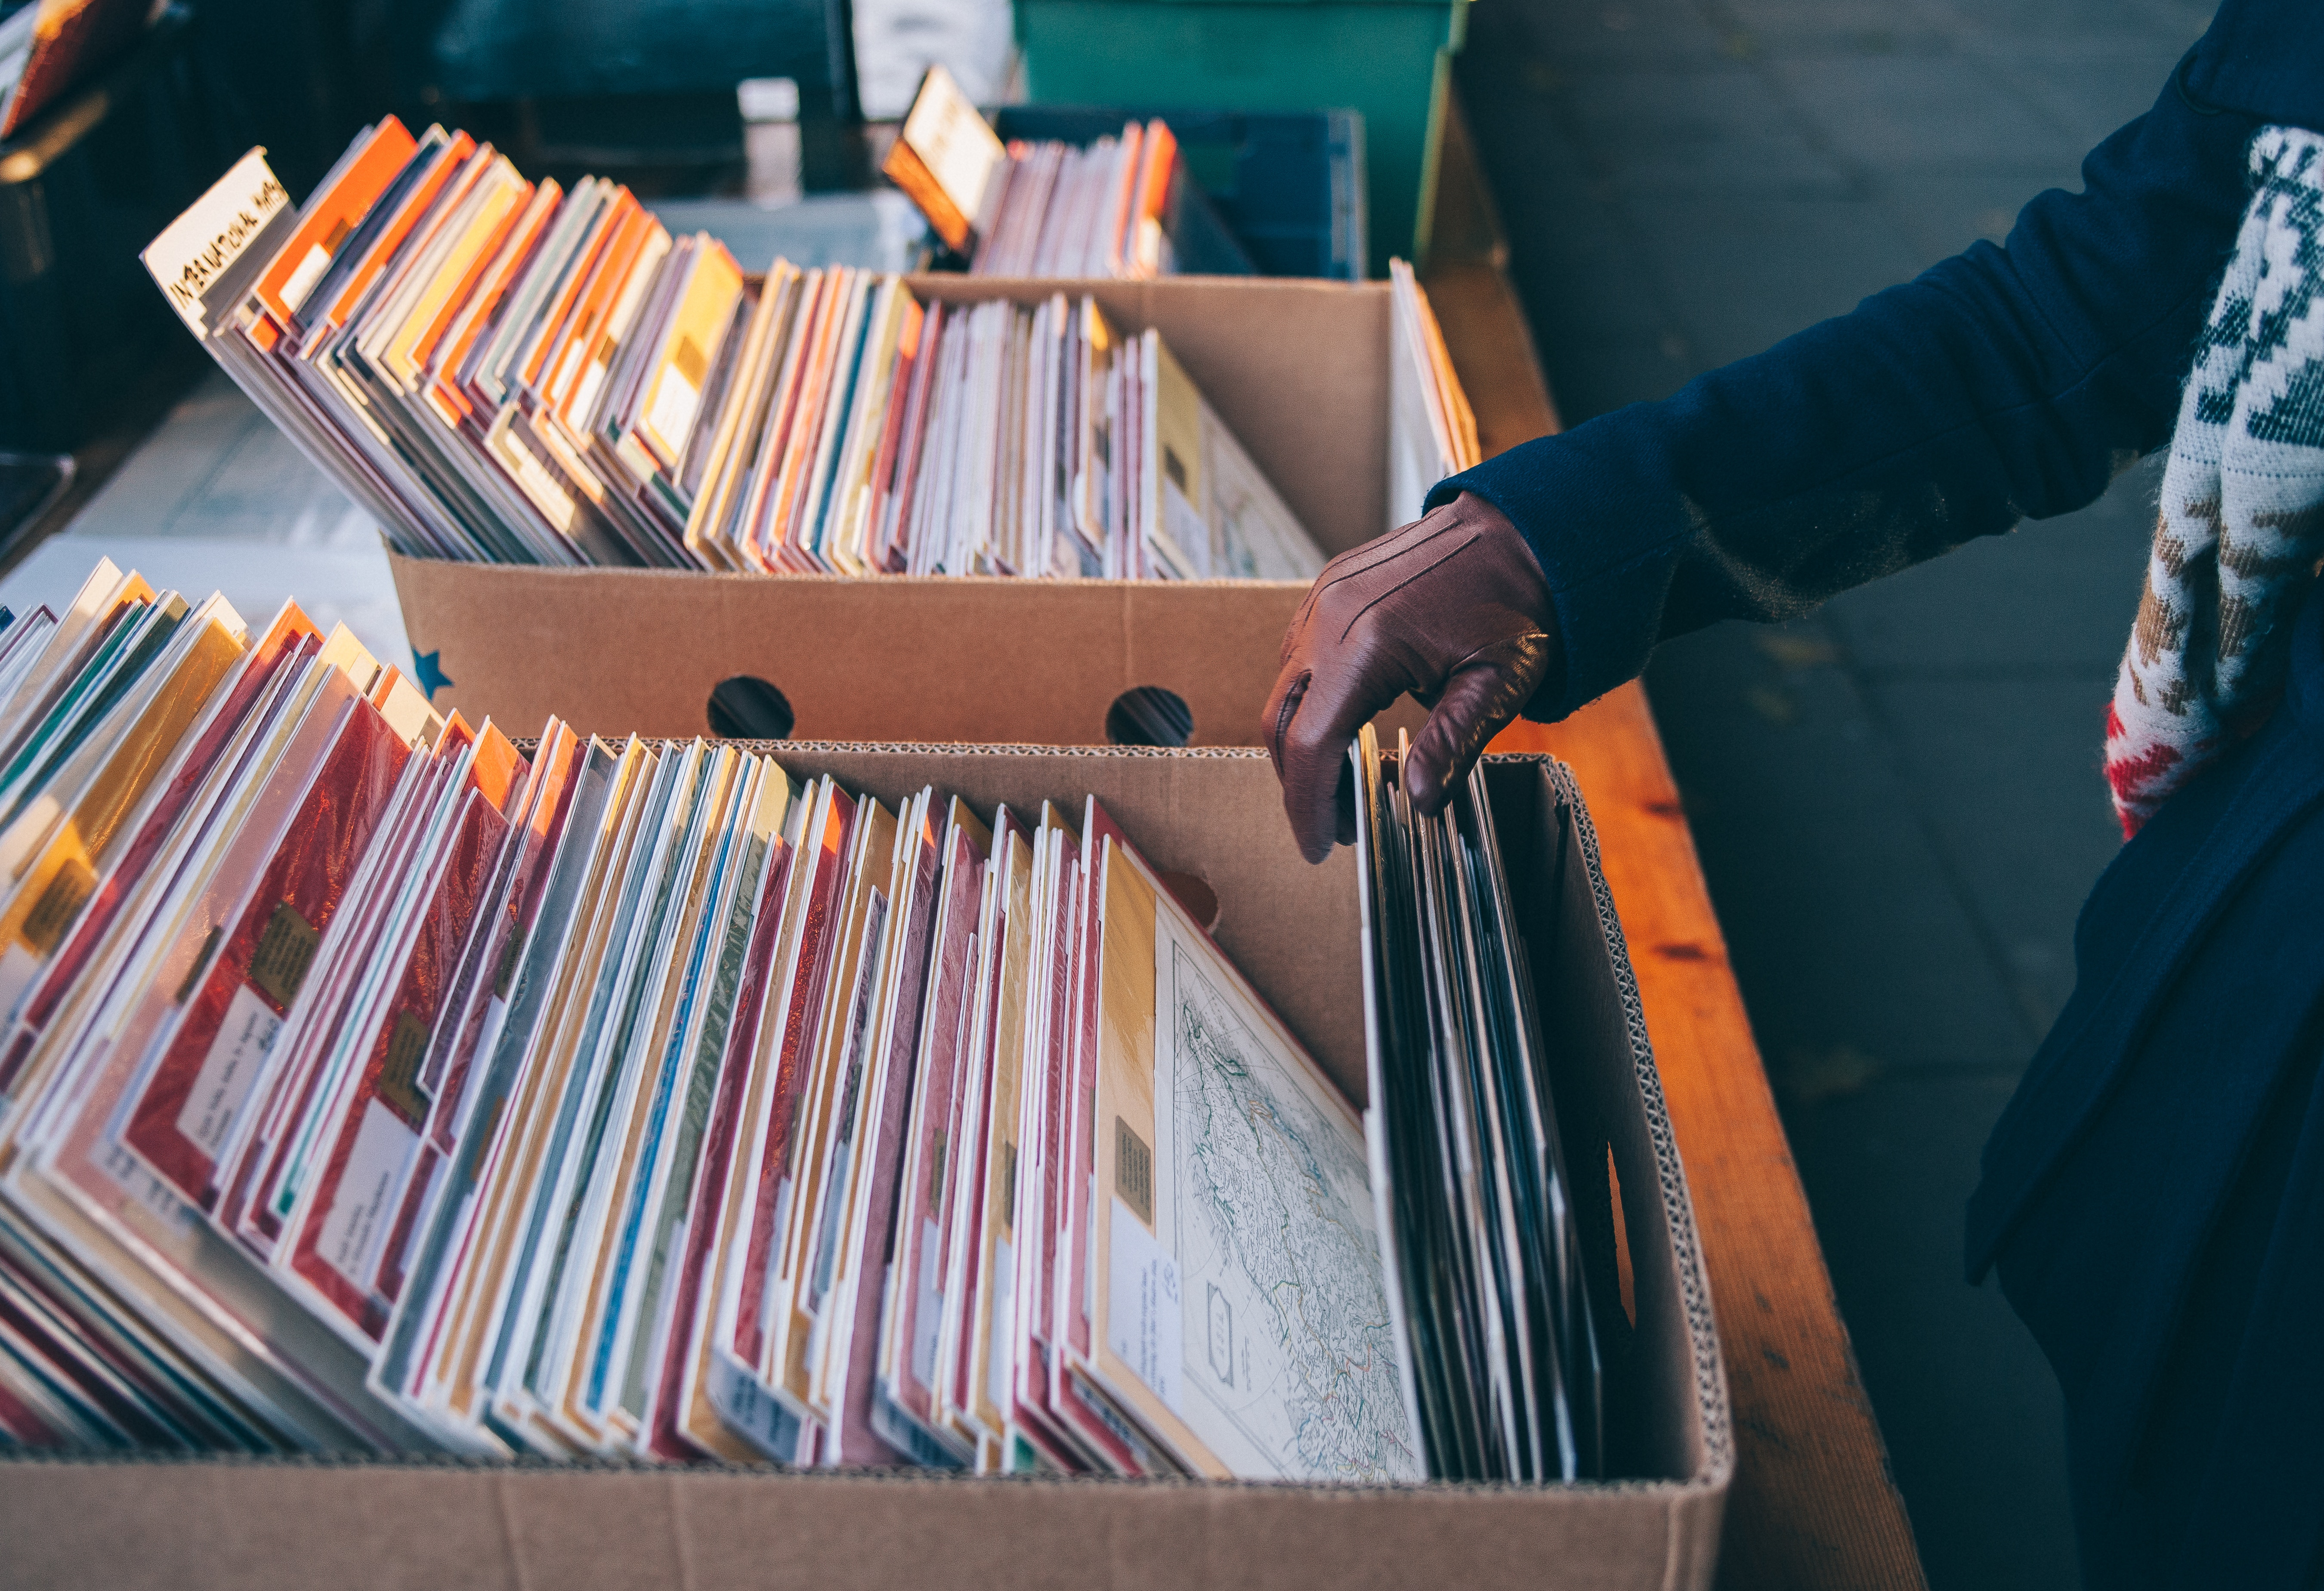 Buying music